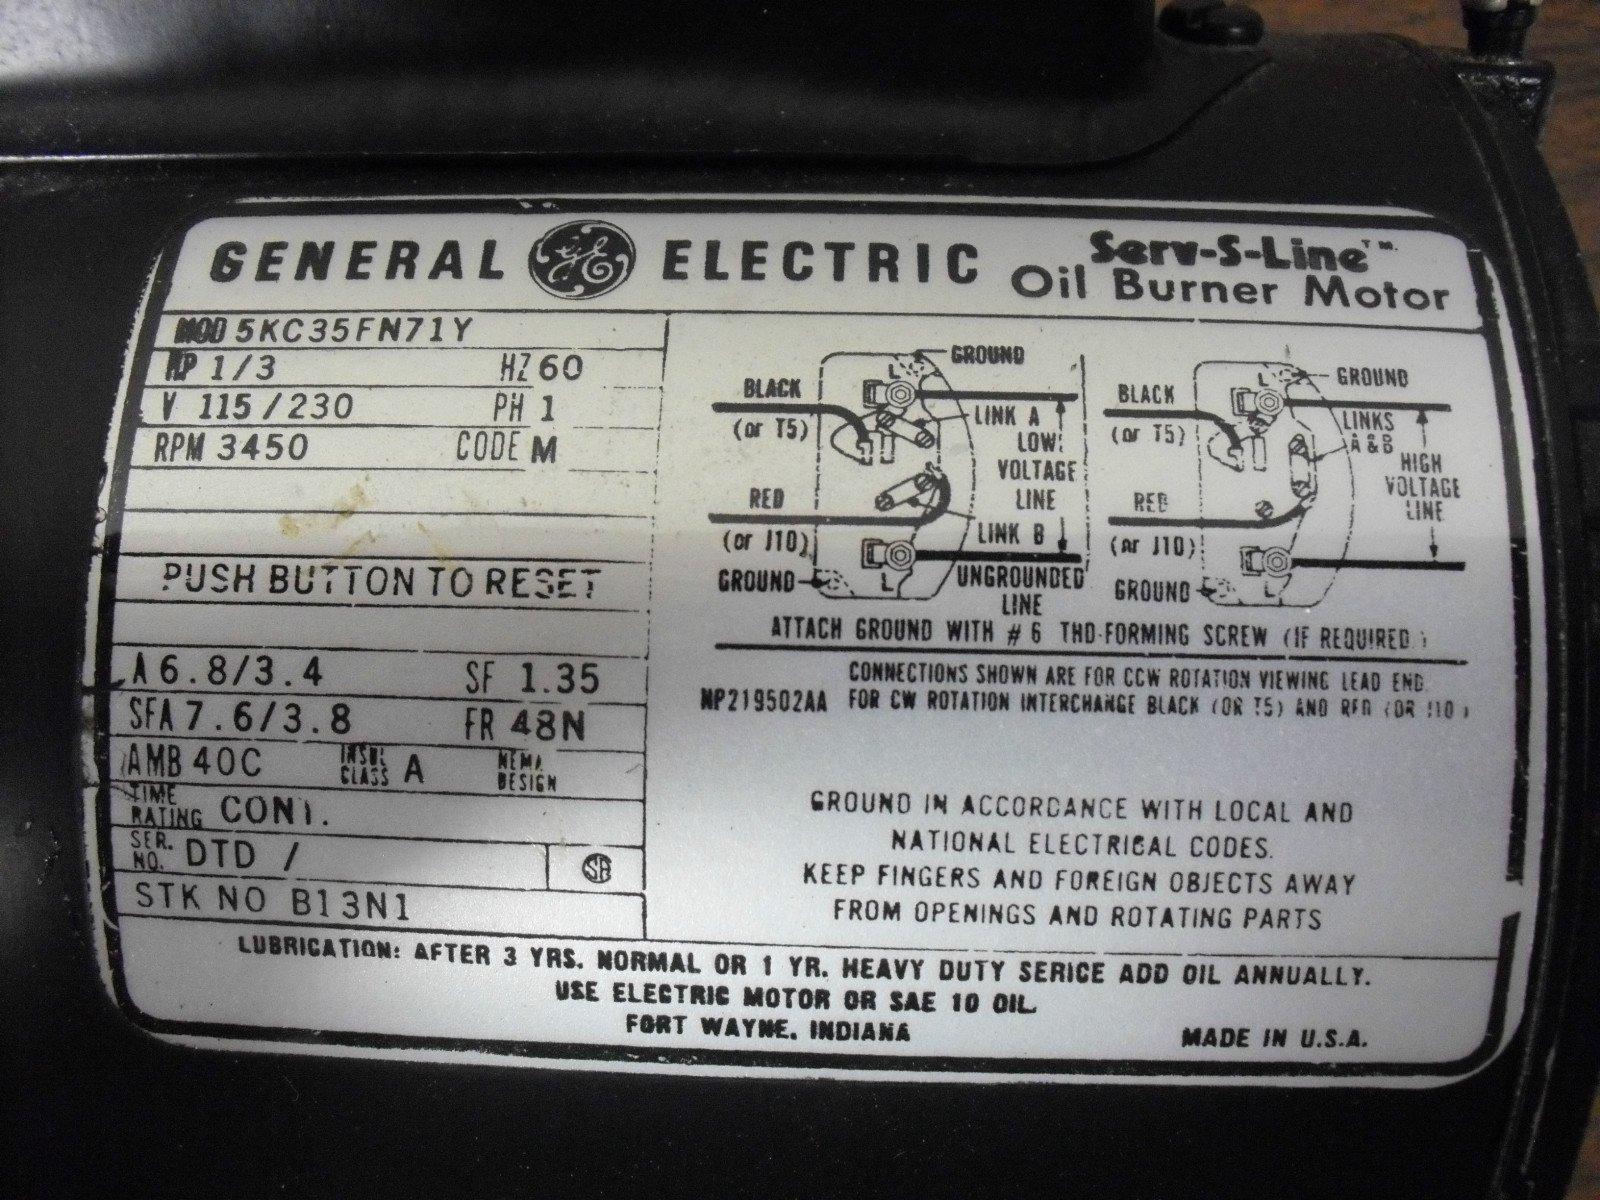 wiring diagram for ge motor 5kc35k6335 - HomeOwnersHub   Ge Motor Wiring Schematic      HomeOwnersHub